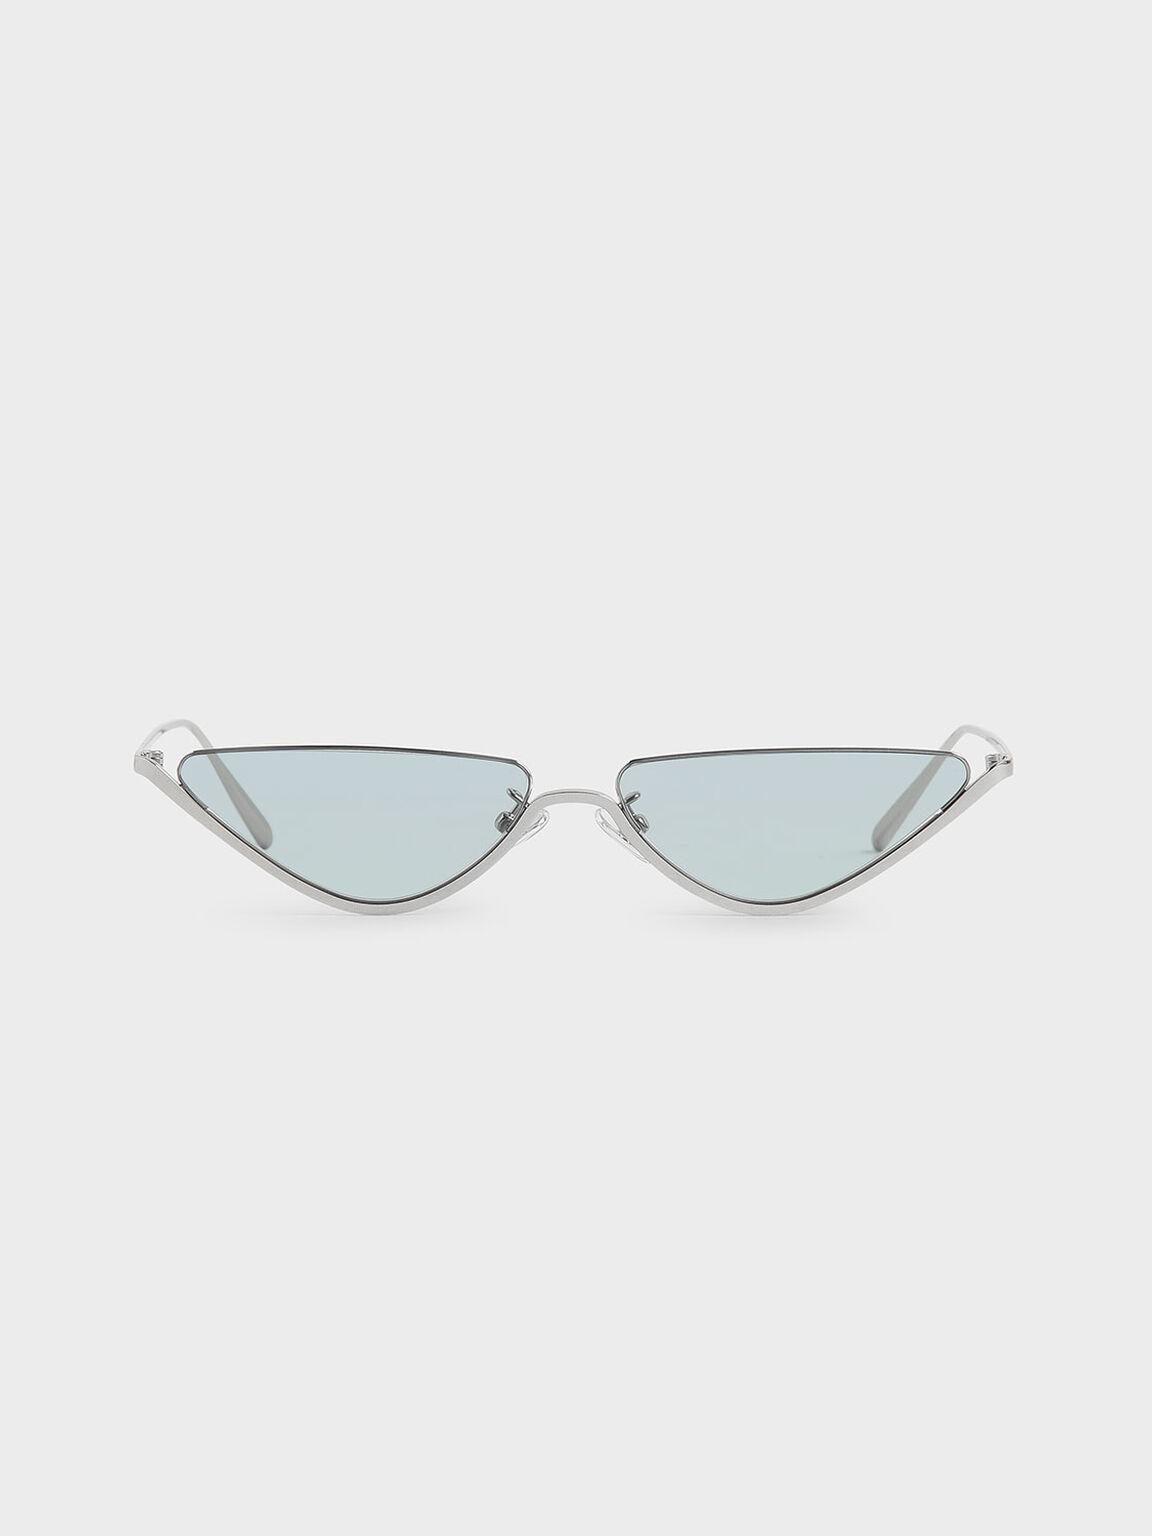 金屬框貓眼墨鏡, 藍色, hi-res